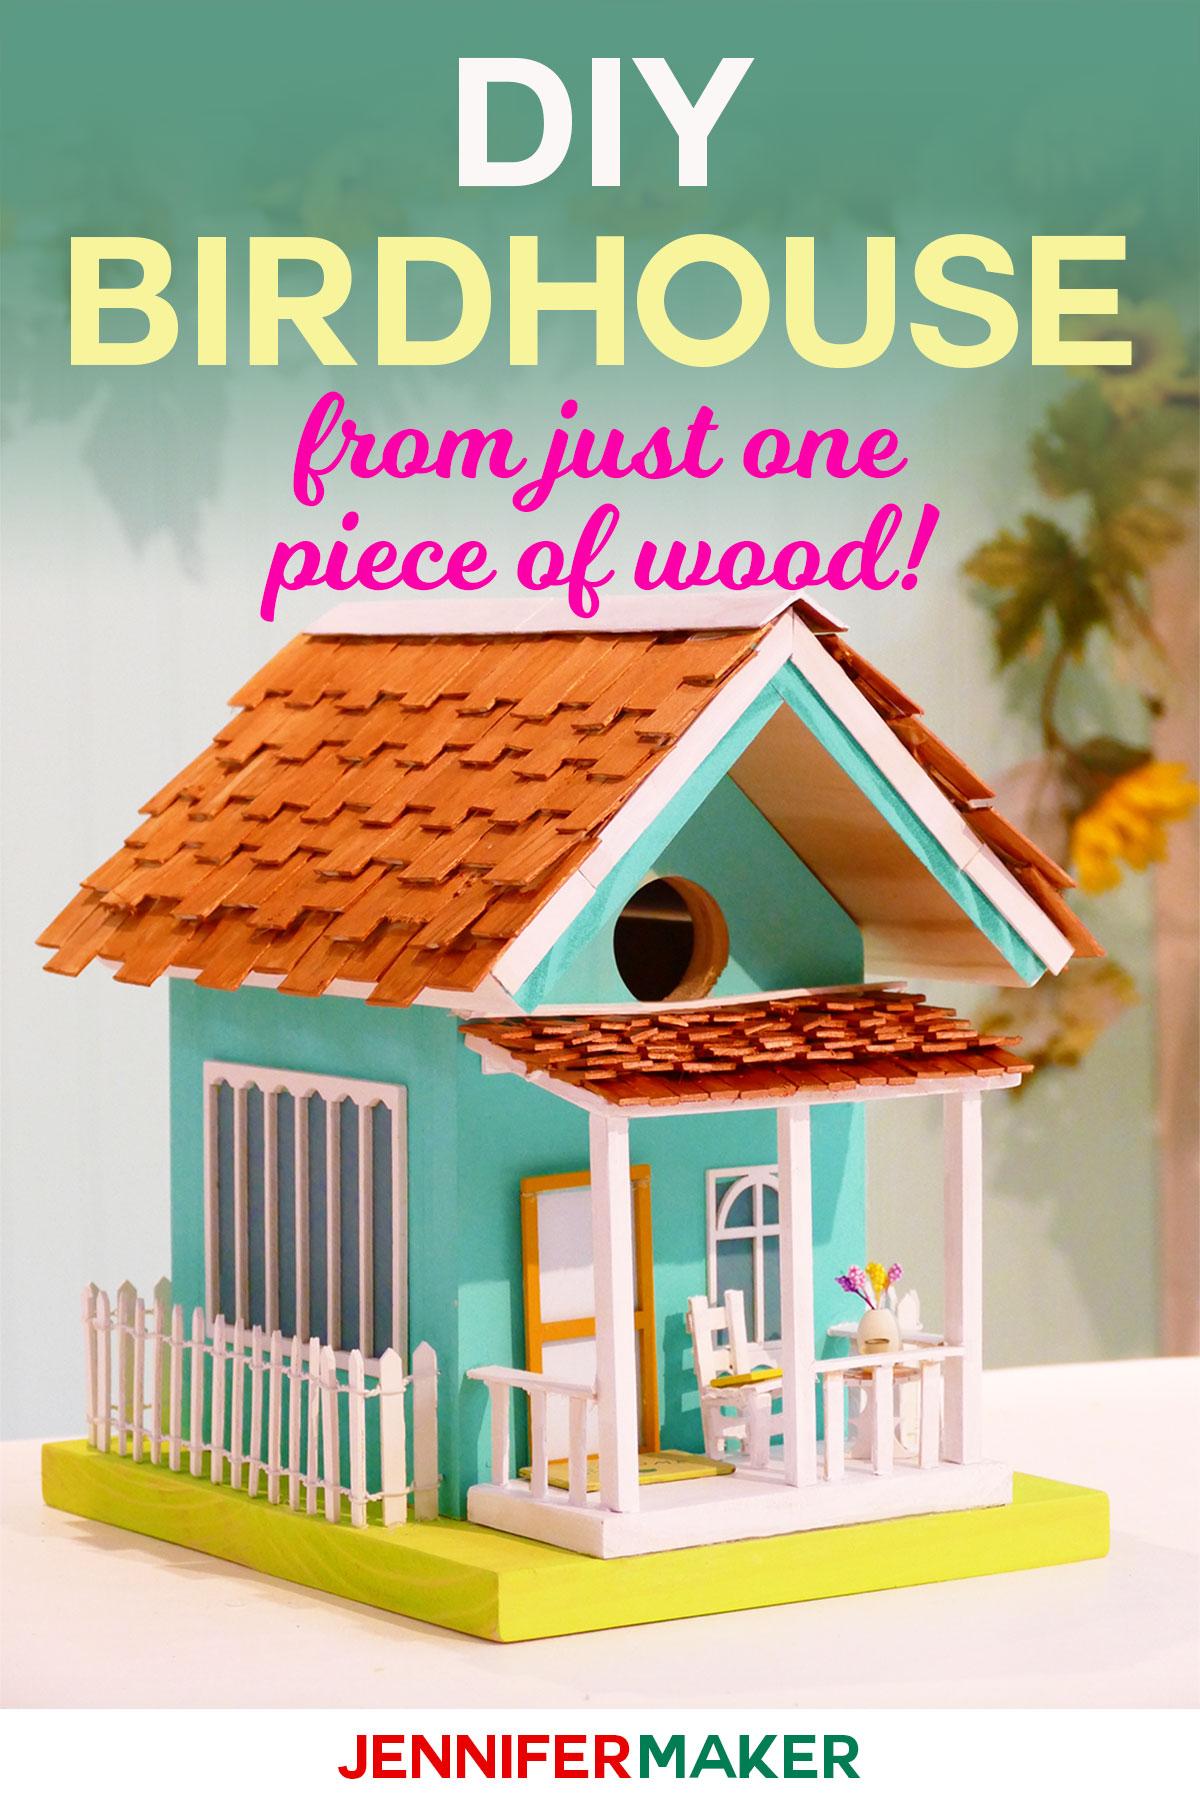 Pokie Dotted Mini Bird Houses Designs on